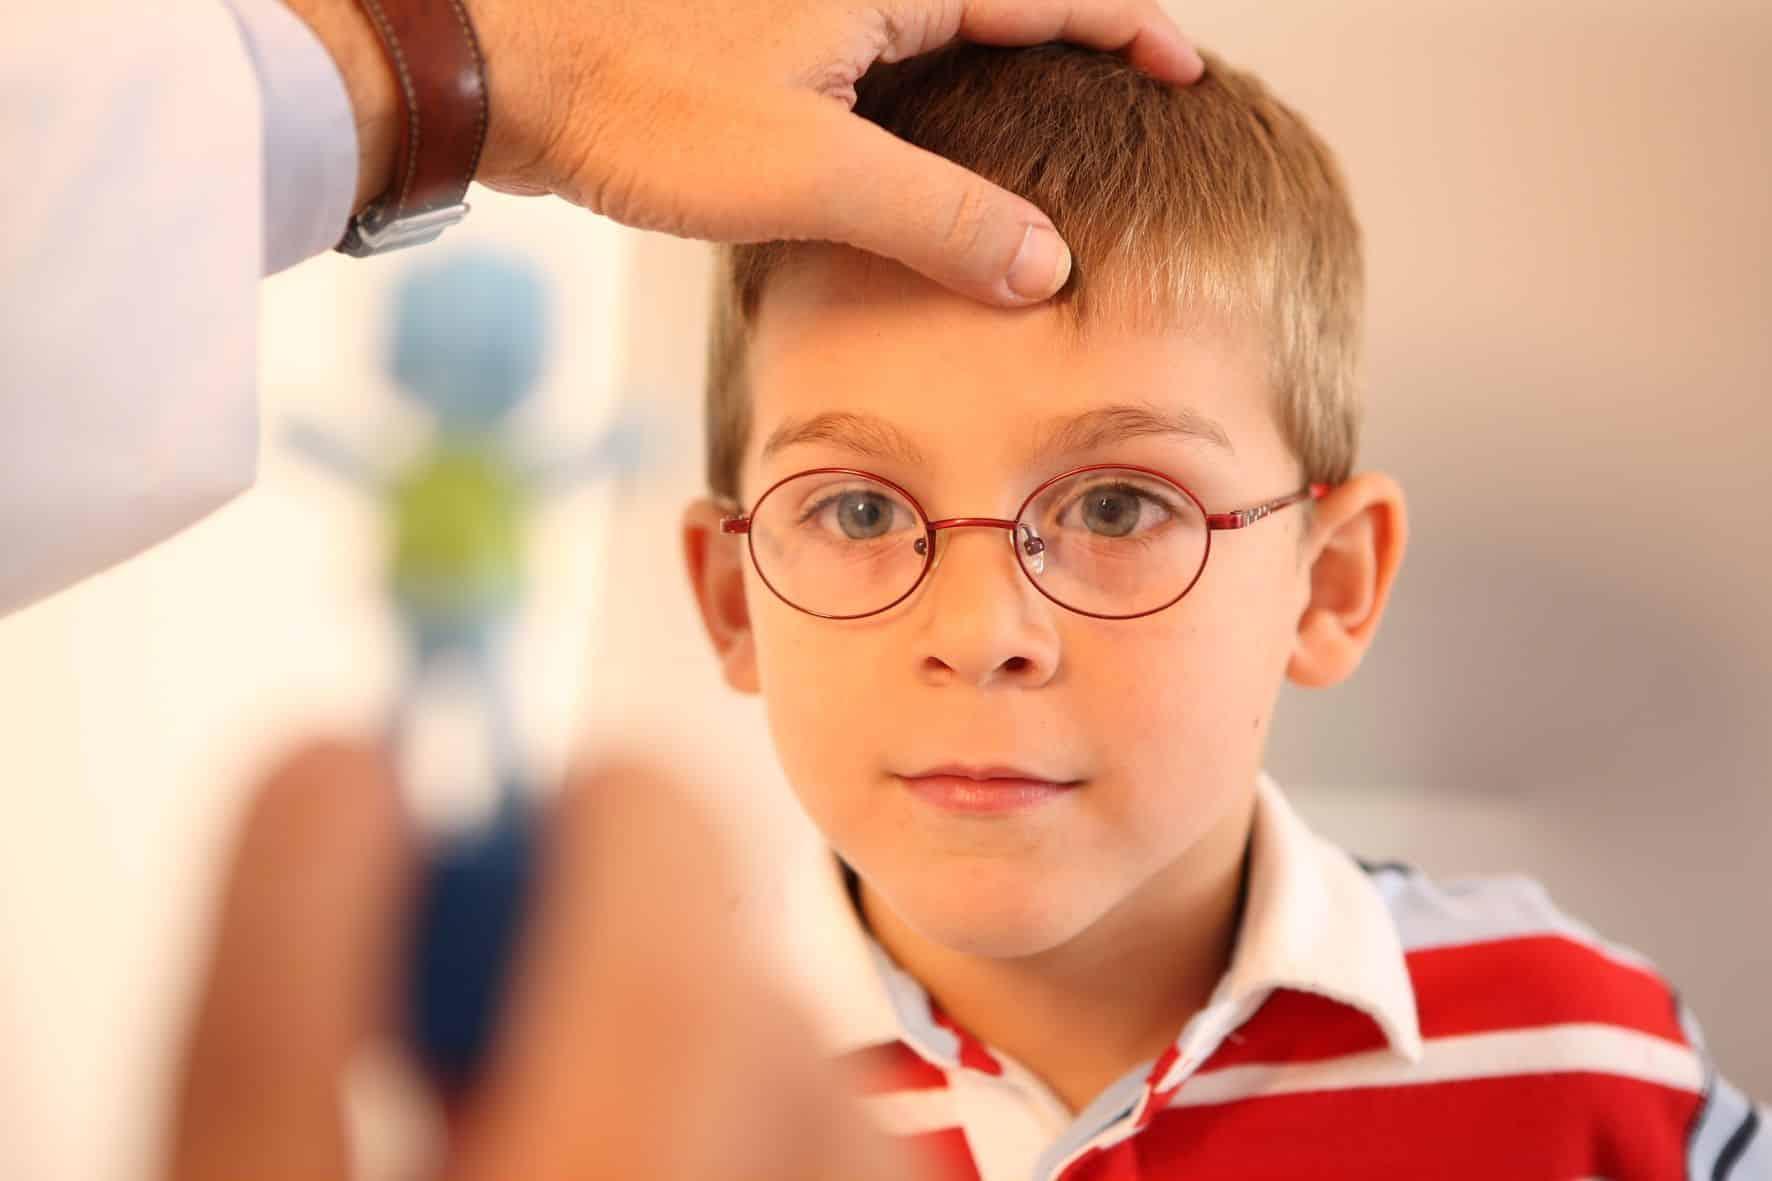 b5d0a35d3e Problemas oculares en la infancia - Área Oftalmológica Avanzada